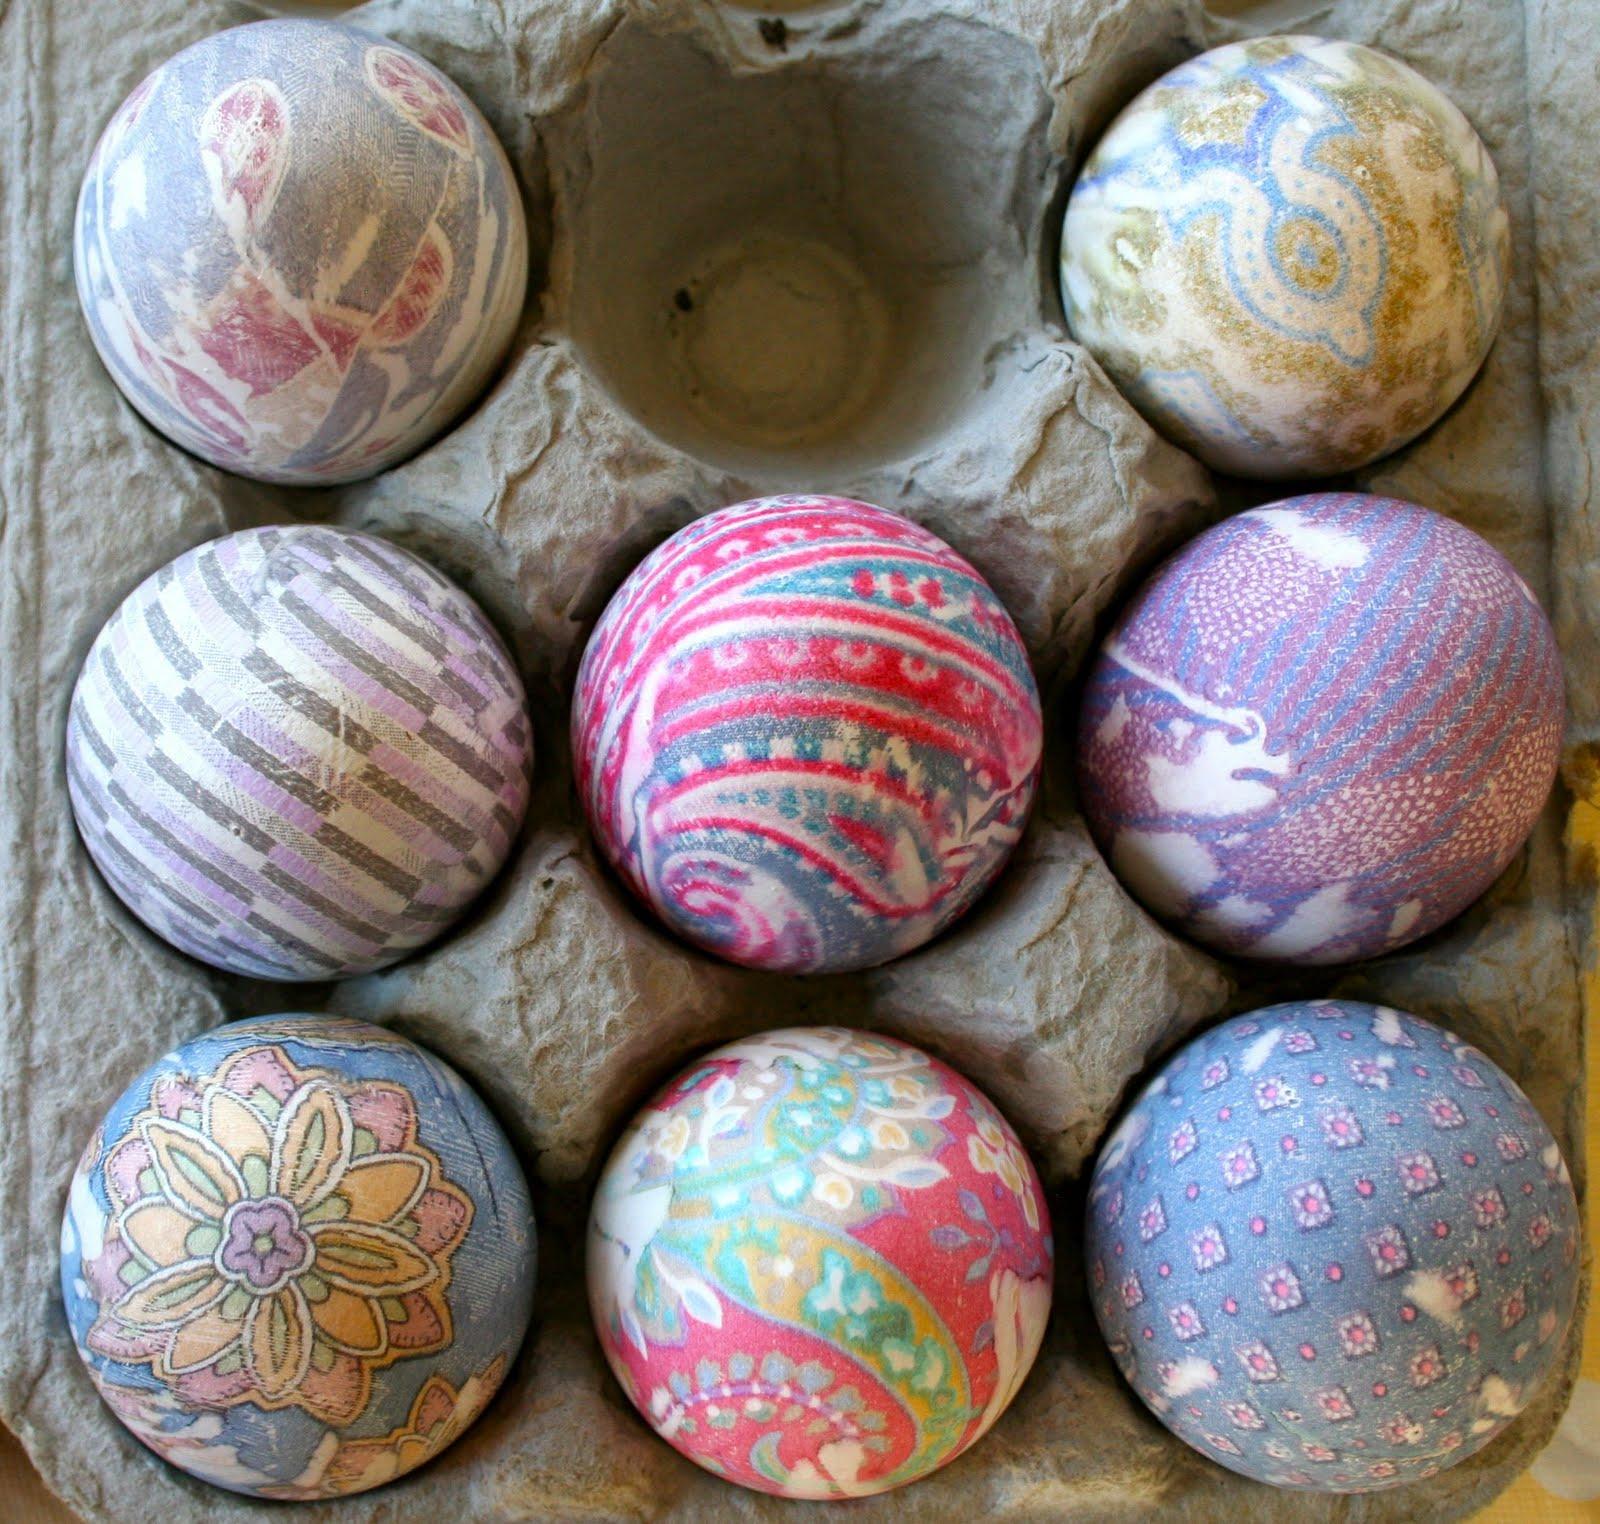 Homemade Egg Dye Using Food Coloring